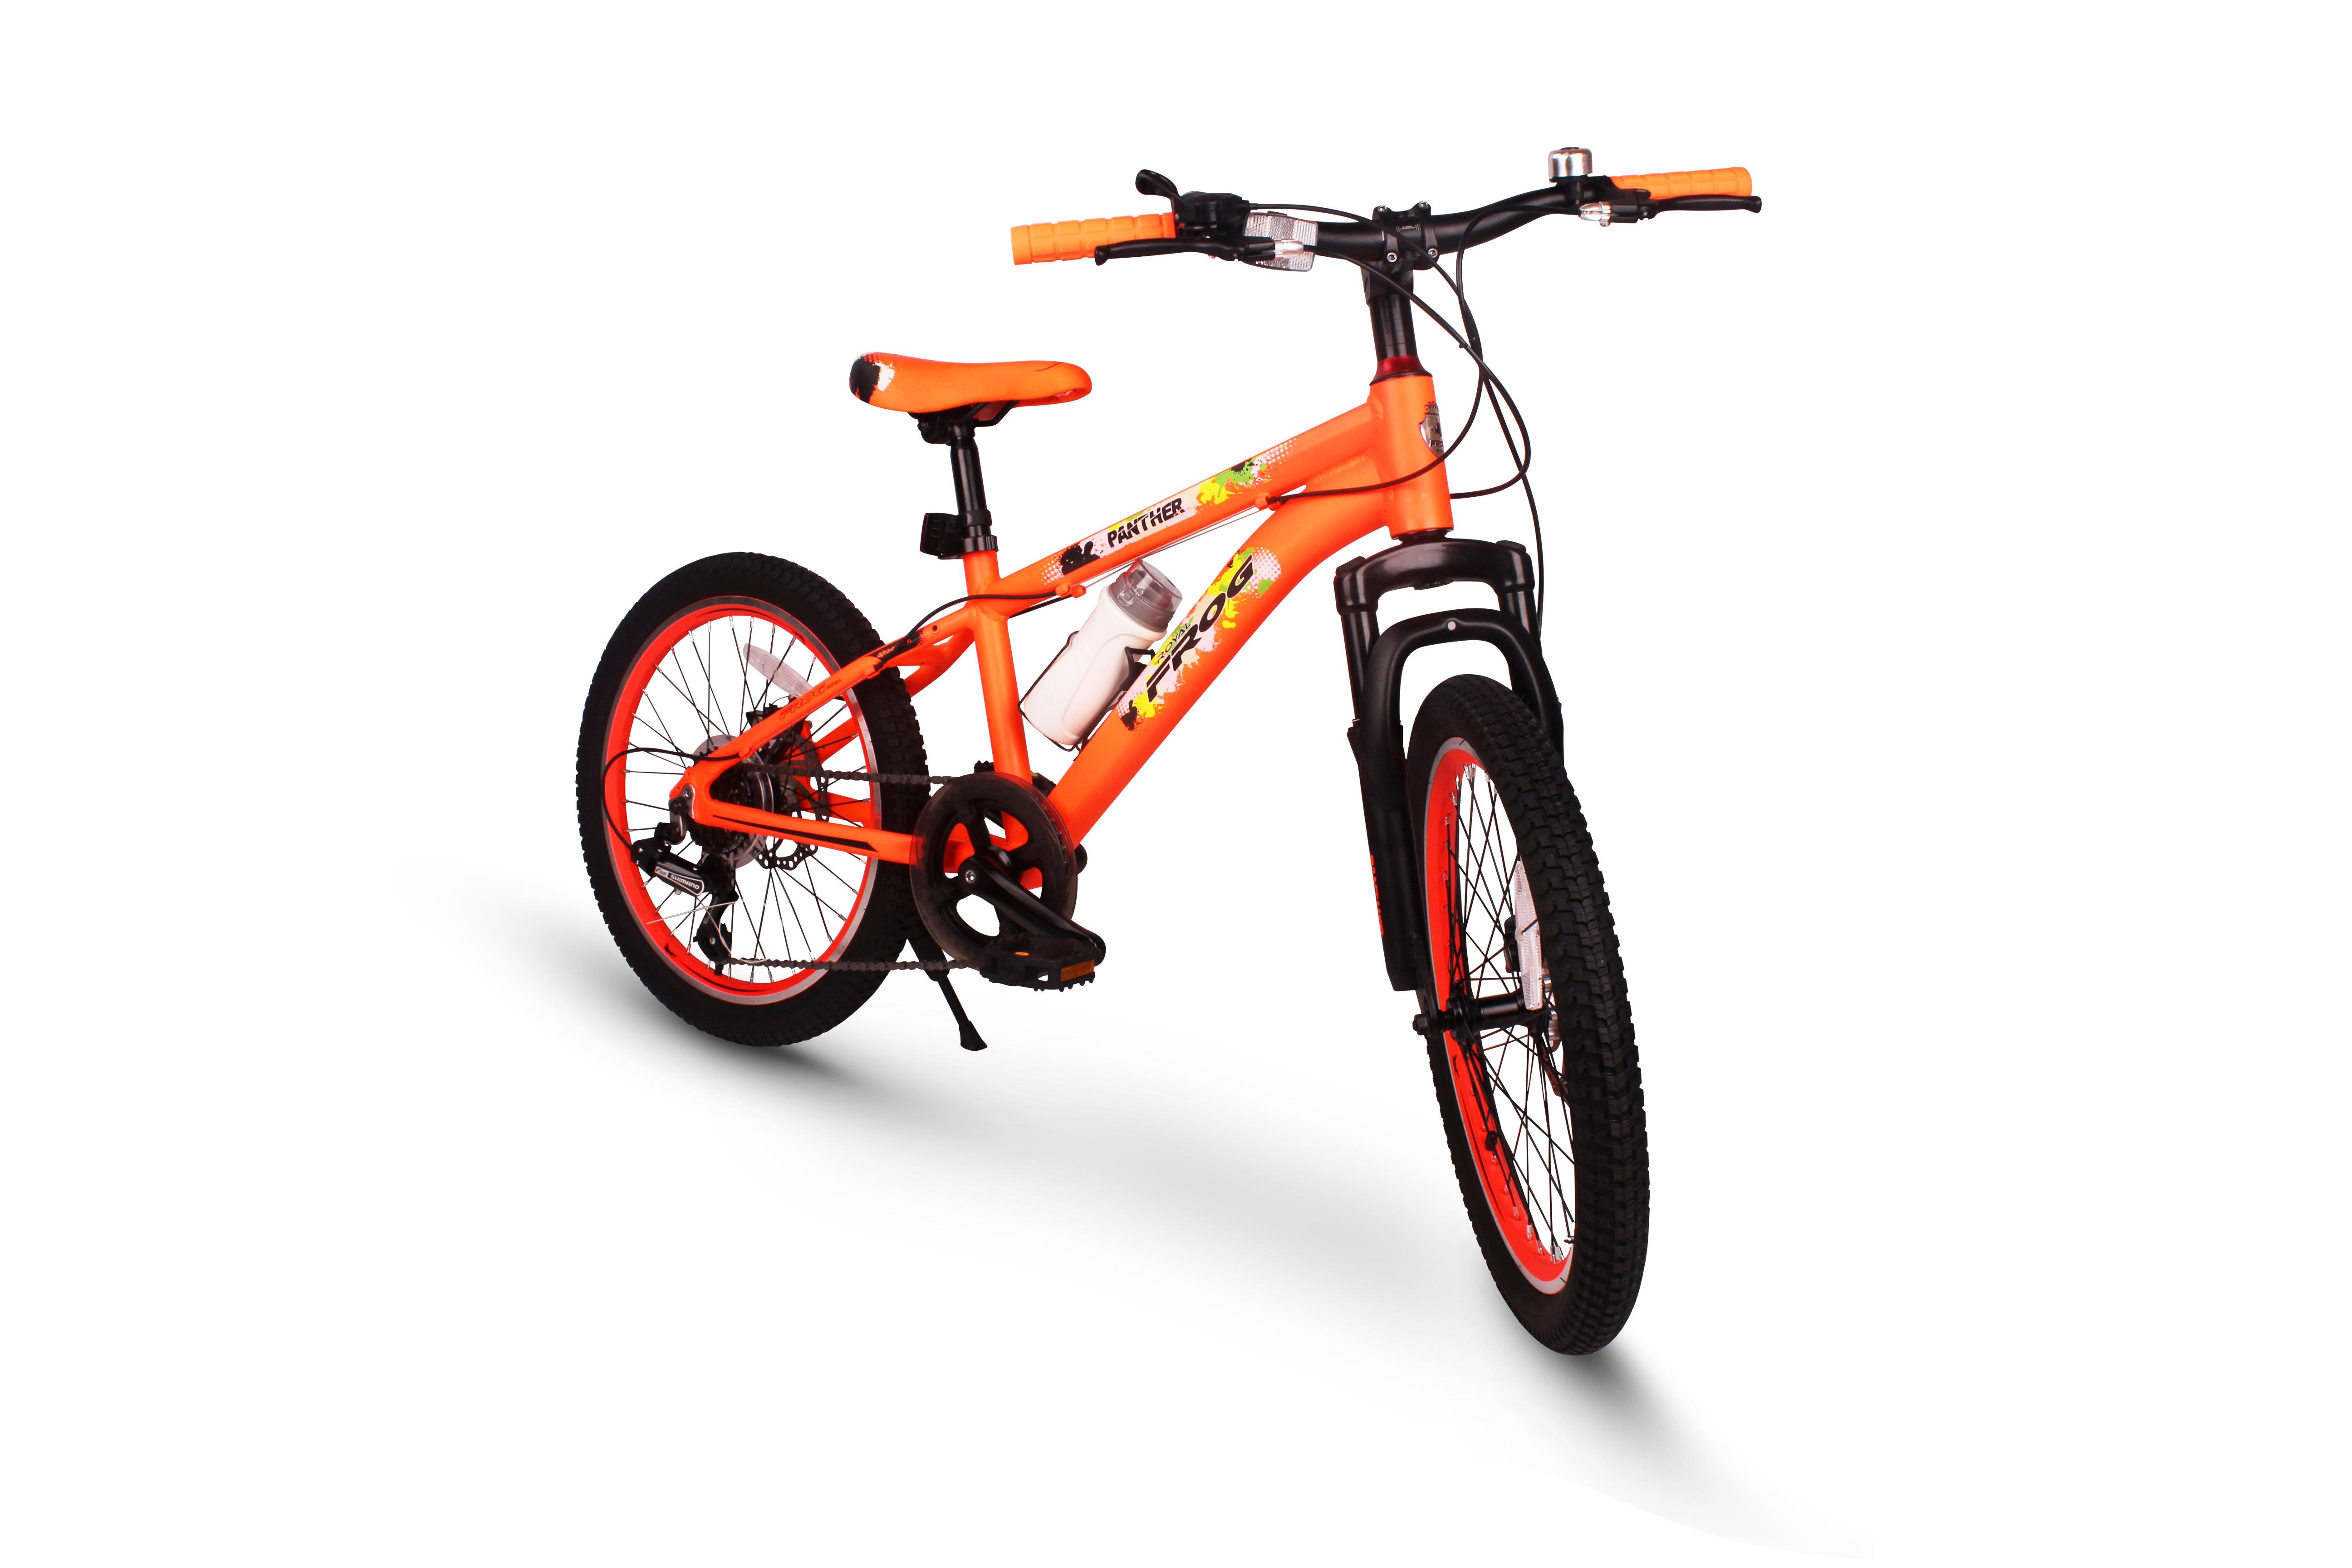 Panther 20 (Orange color) image 2